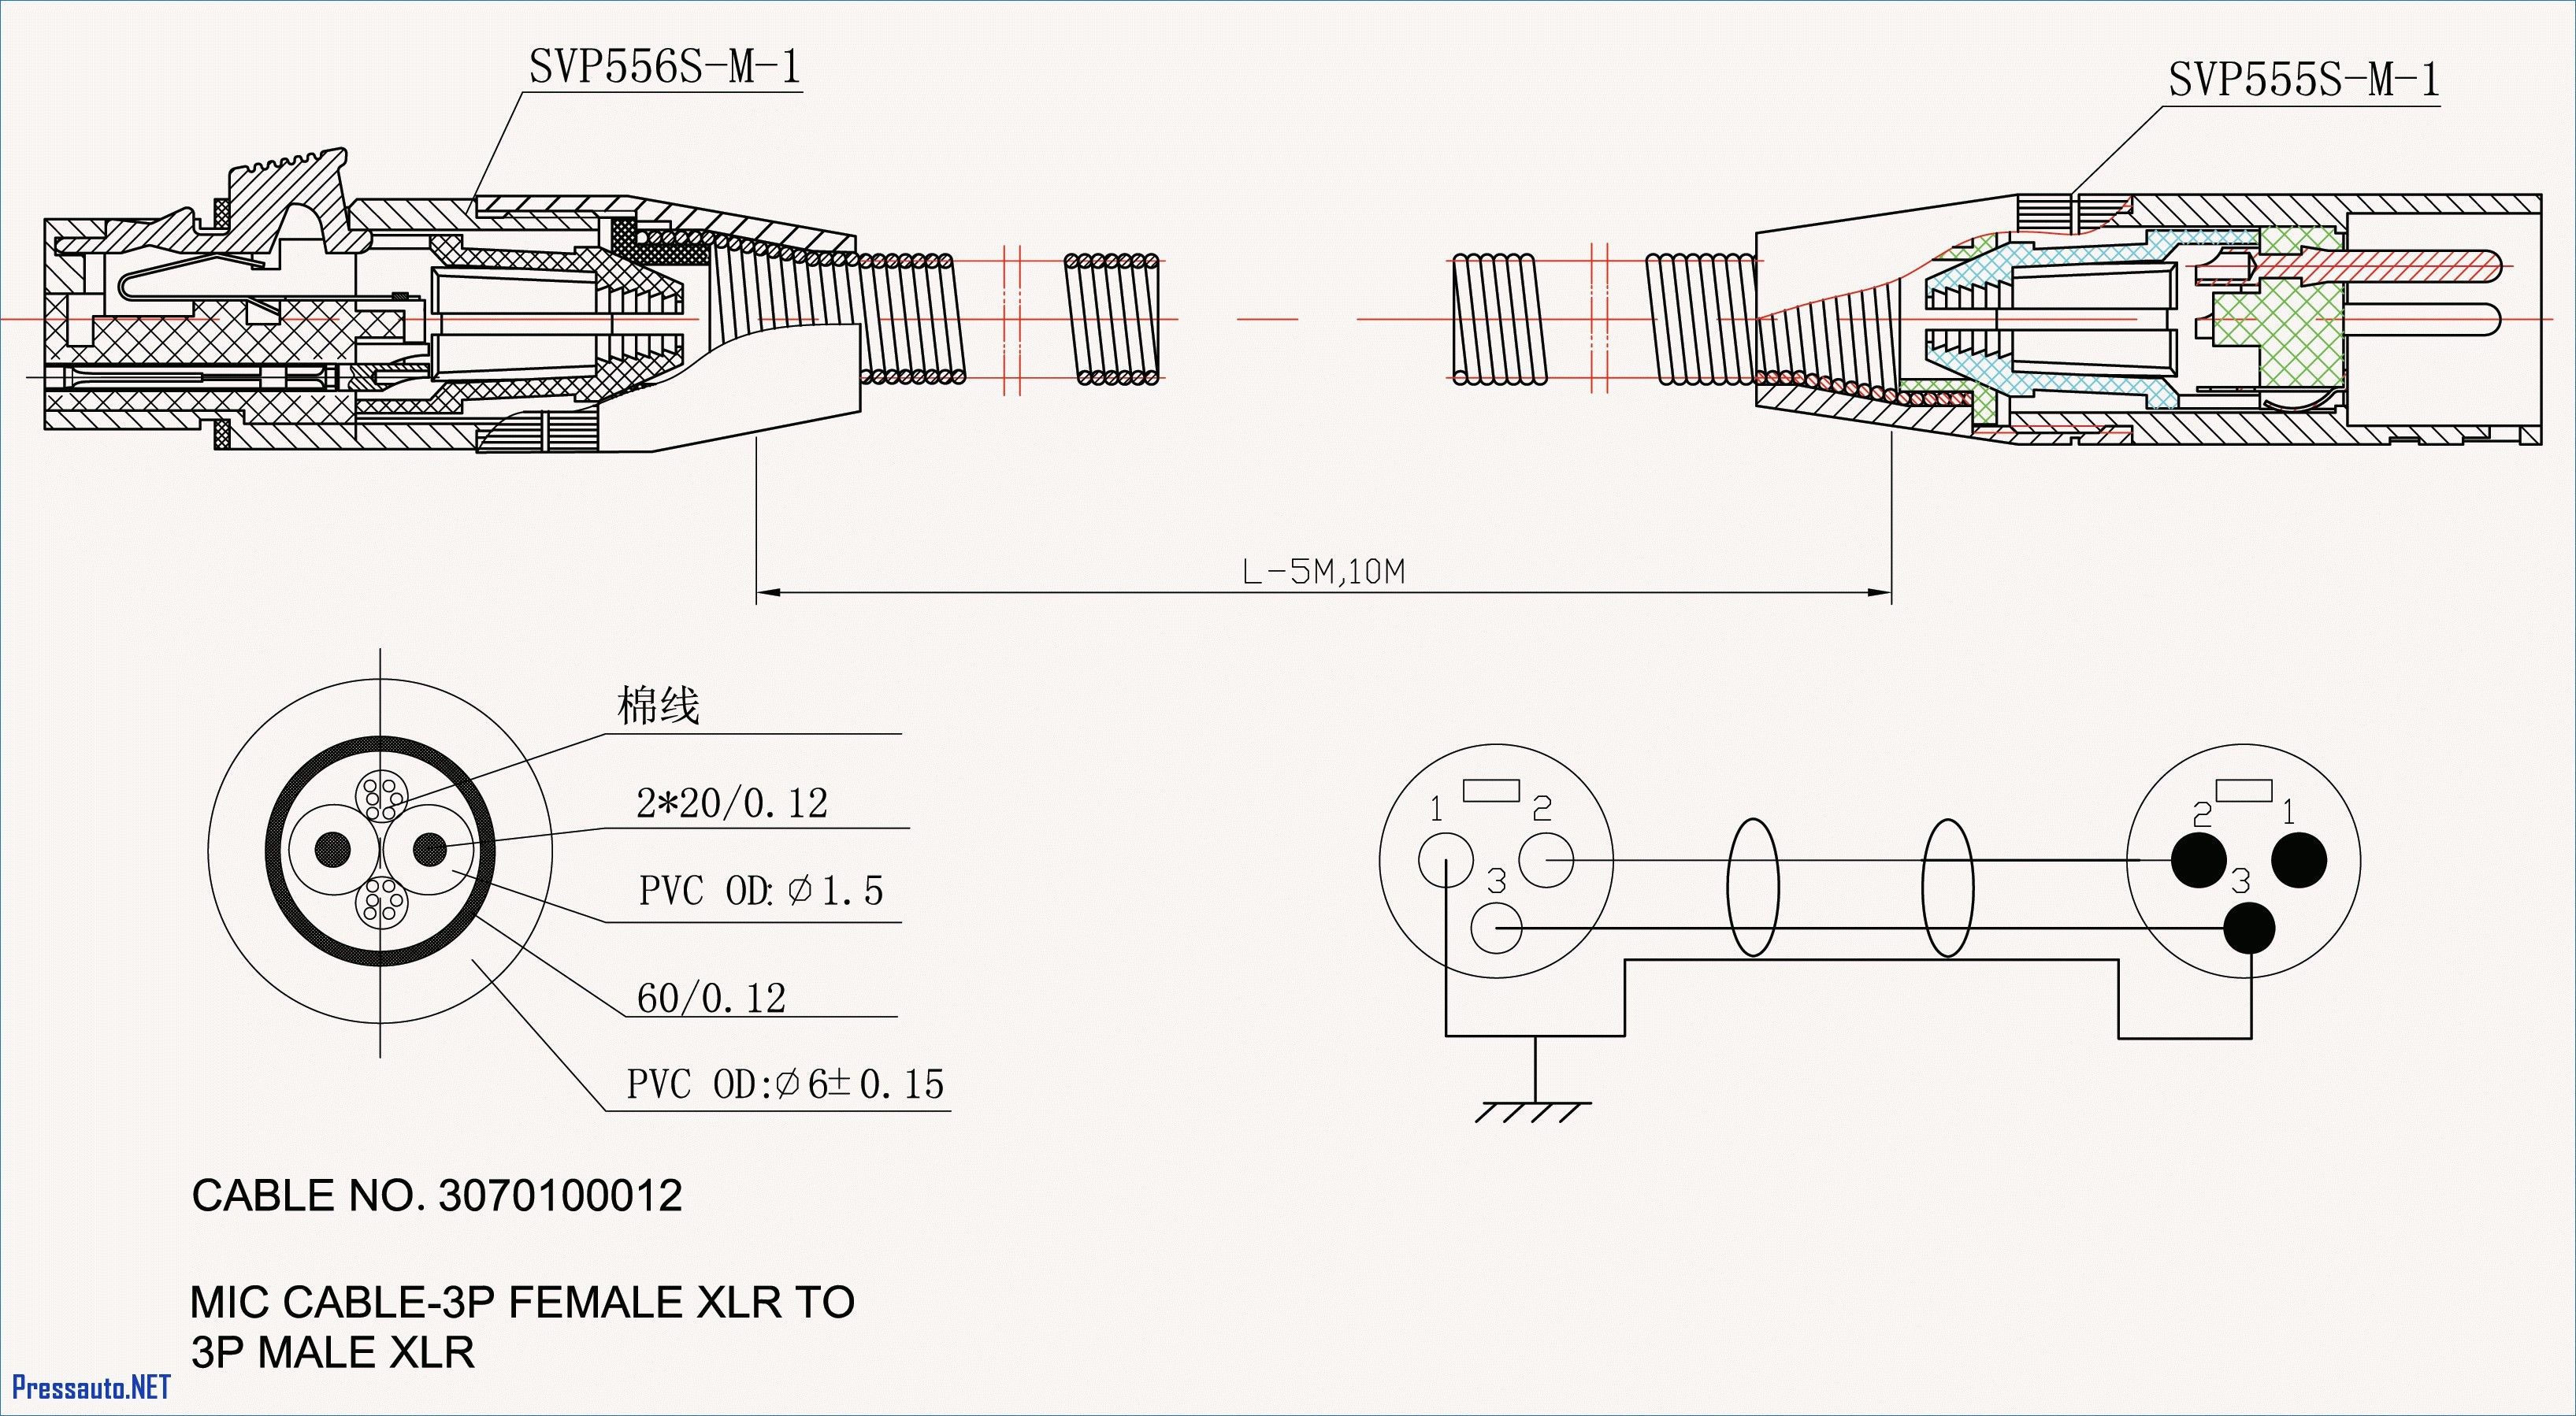 2000 Dodge Caravan Wiring Diagram 1992 Dodge Caravan Wiring Diagram Experts Wiring Diagram • Of 2000 Dodge Caravan Wiring Diagram